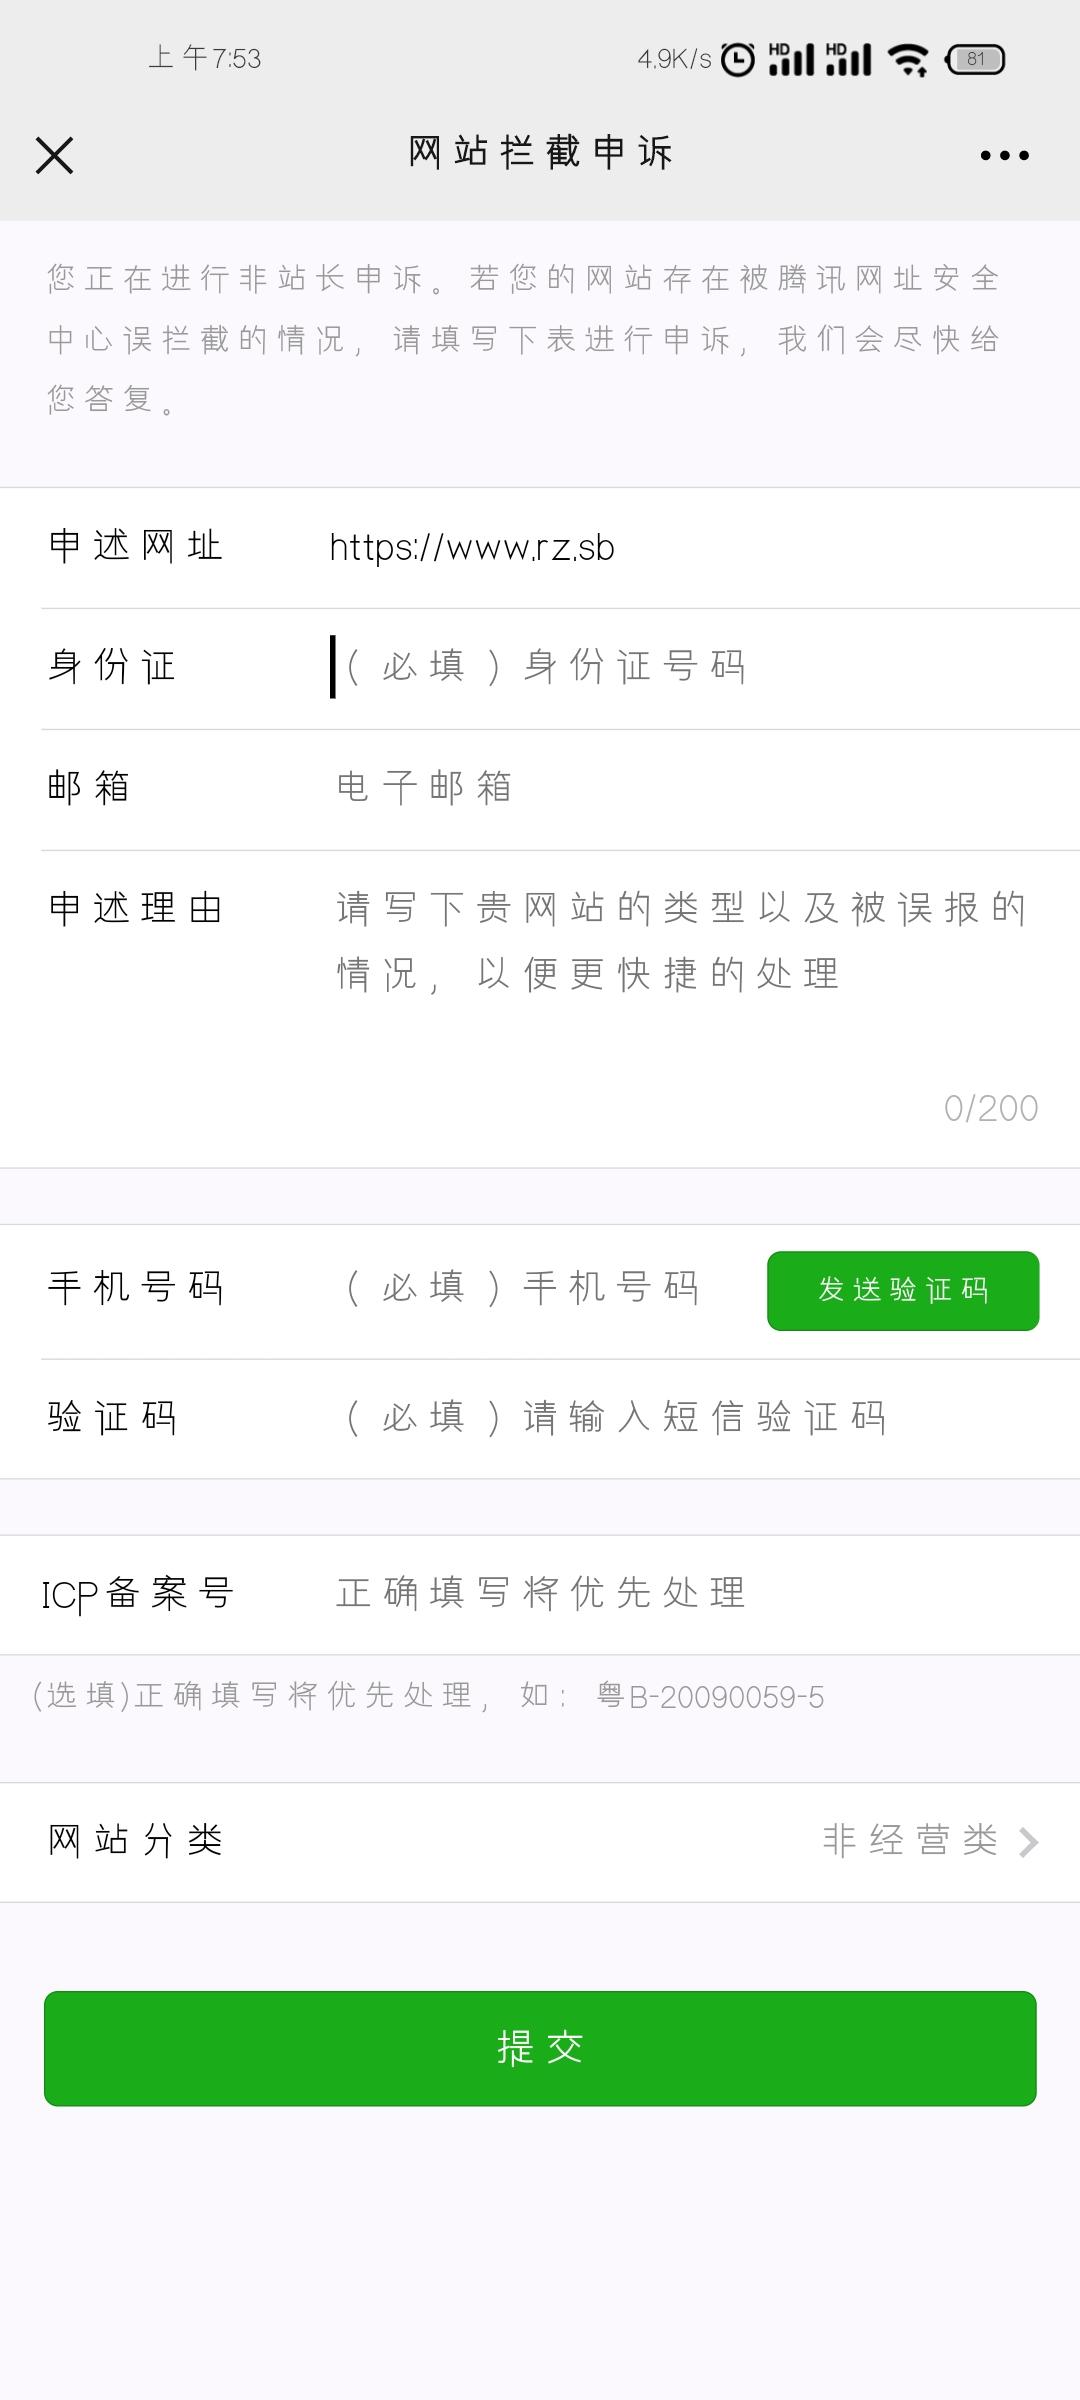 Screenshot_2021-07-04-07-53-11-356_com.tencent.mm.jpg